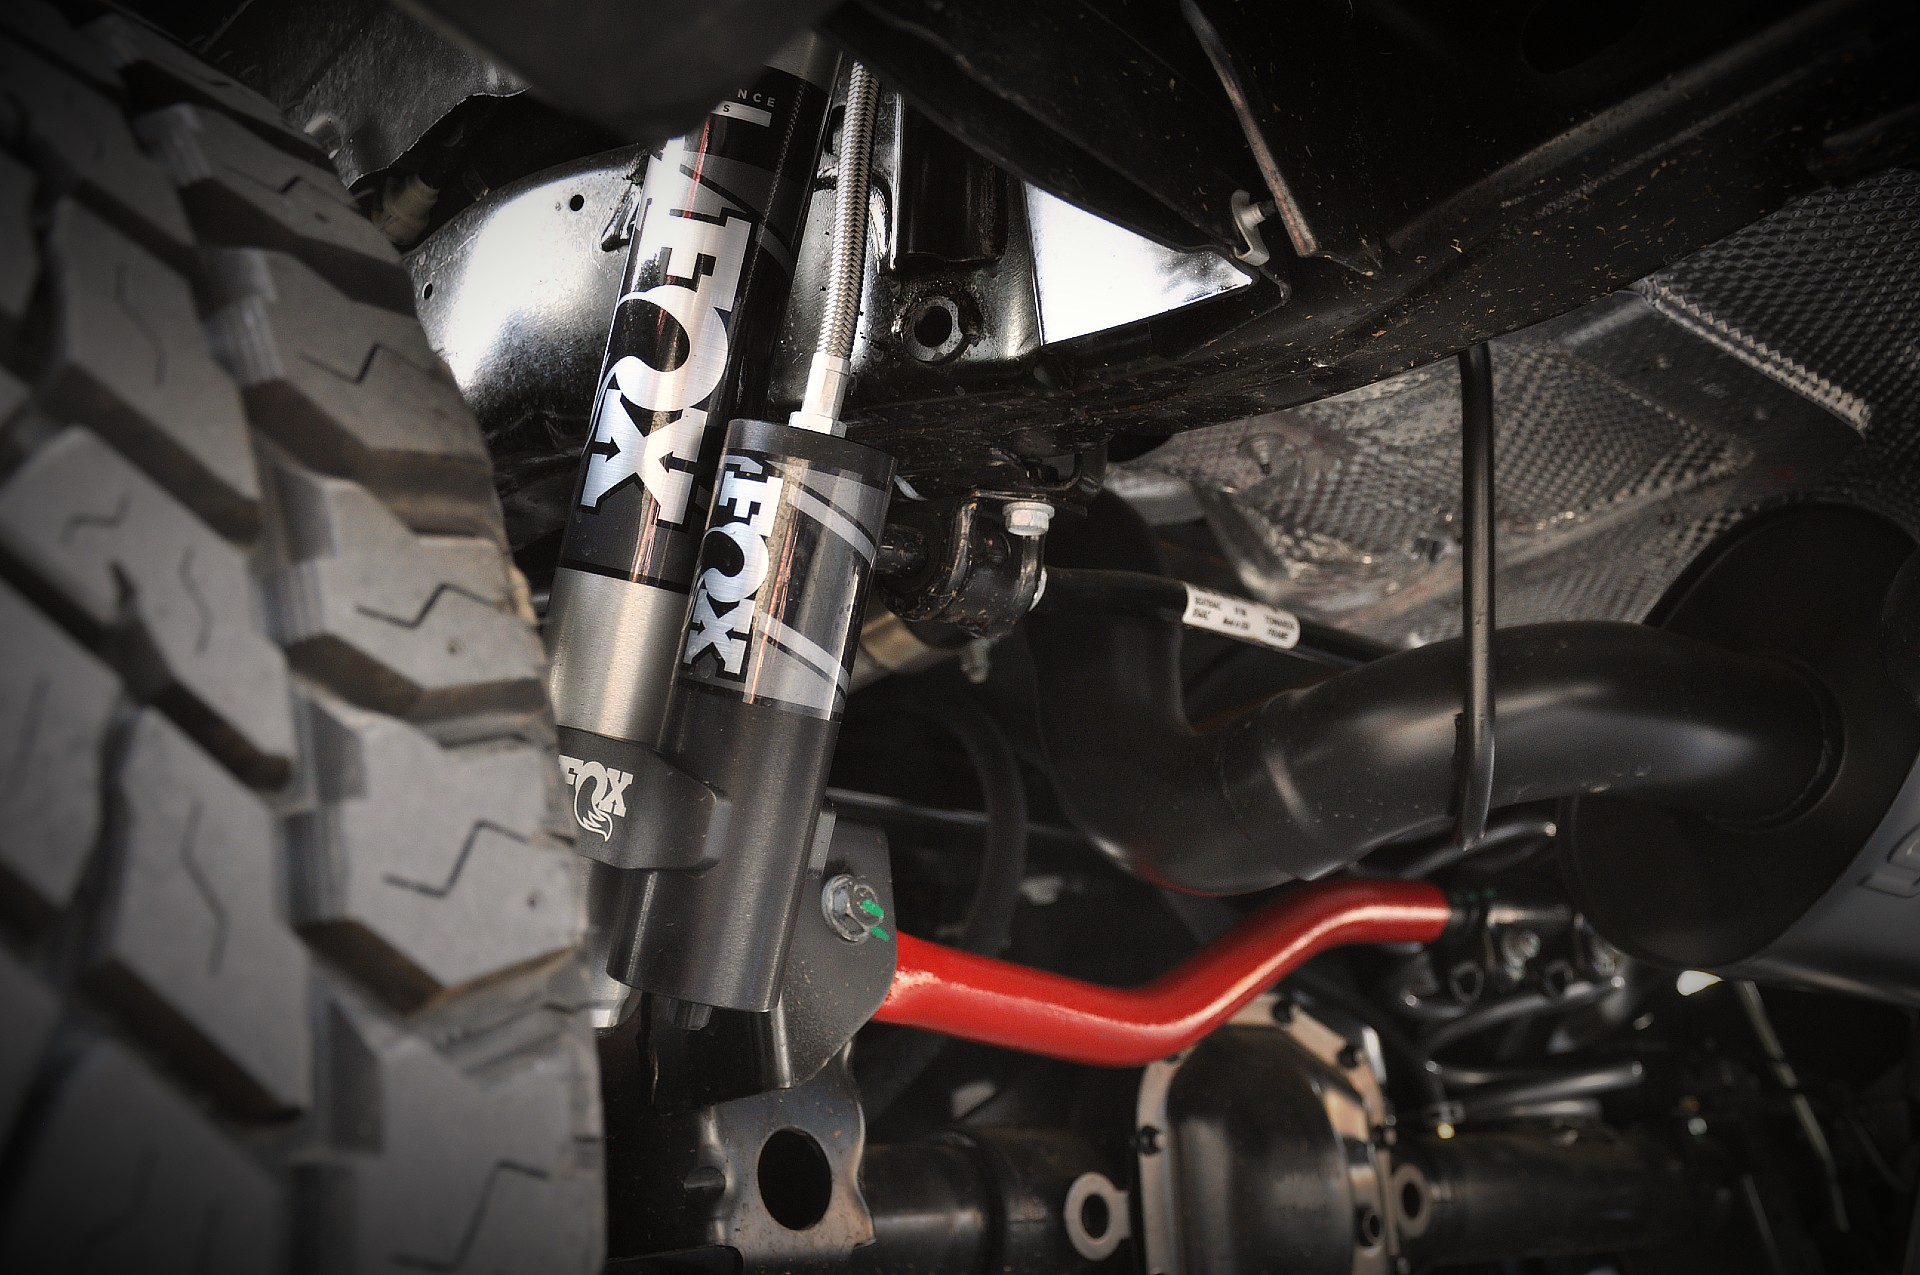 kit rehausse suspensions fox jeep wrangler jl indiancars lift kit